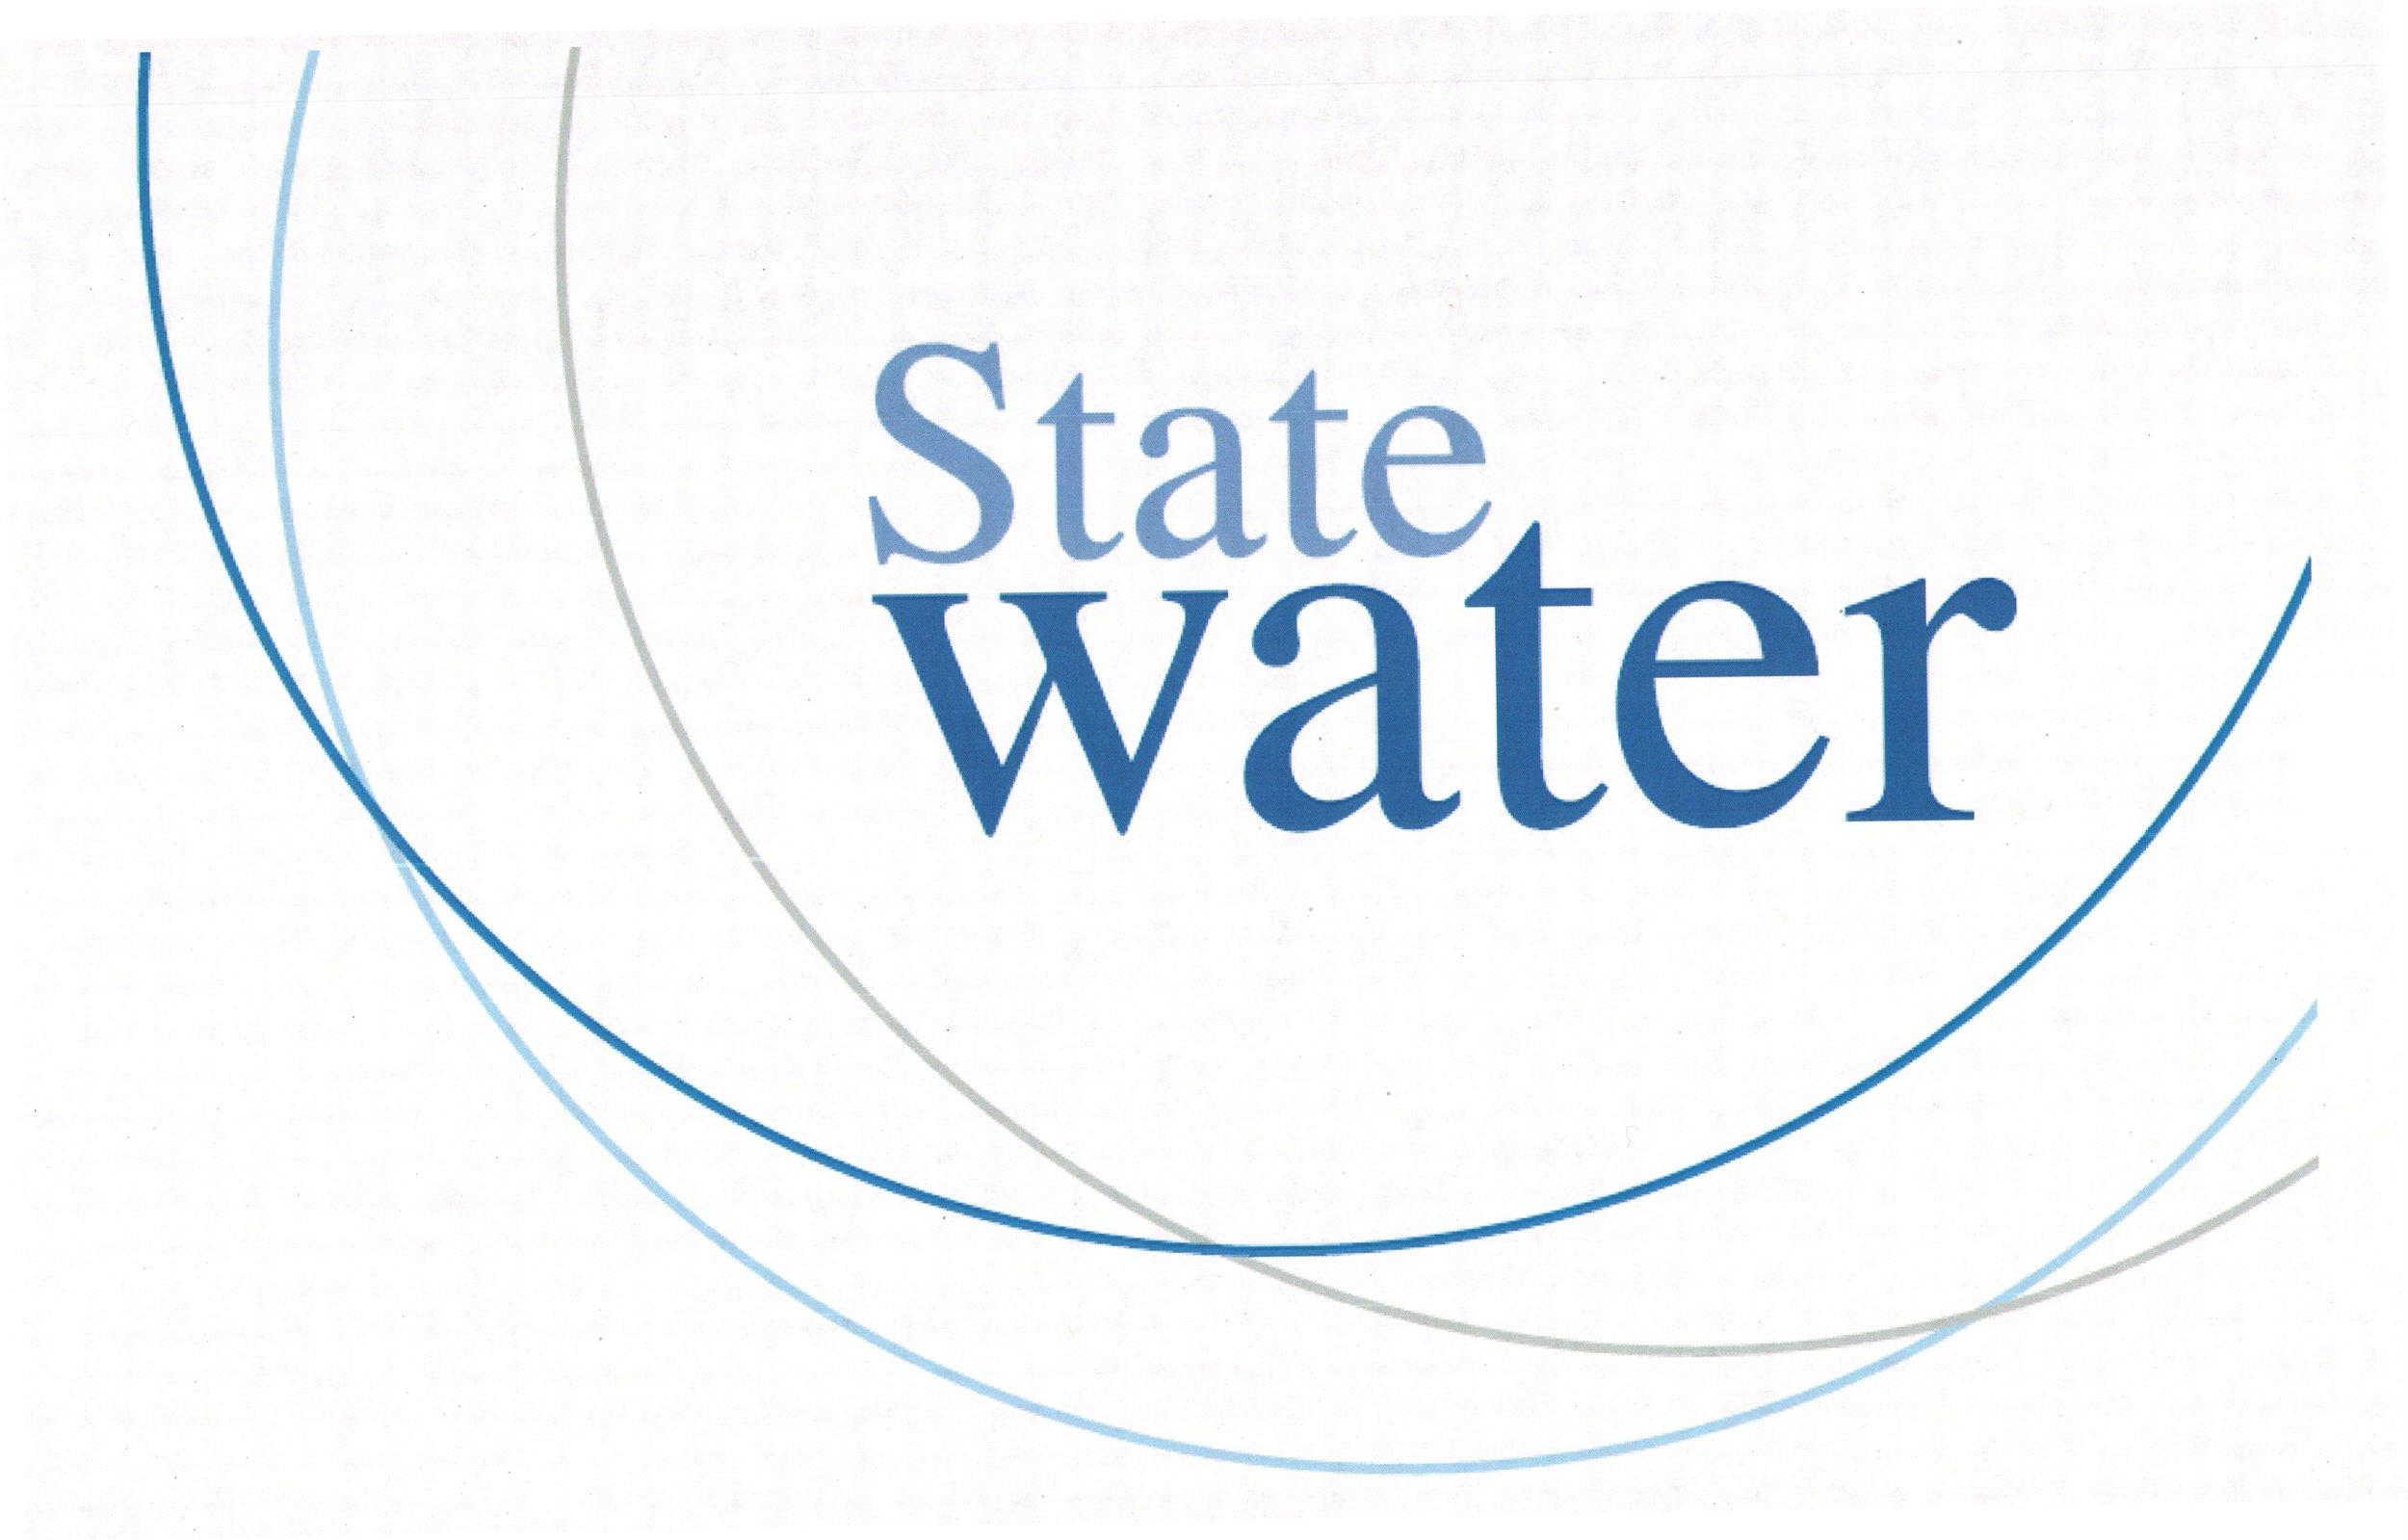 statewater.jpg